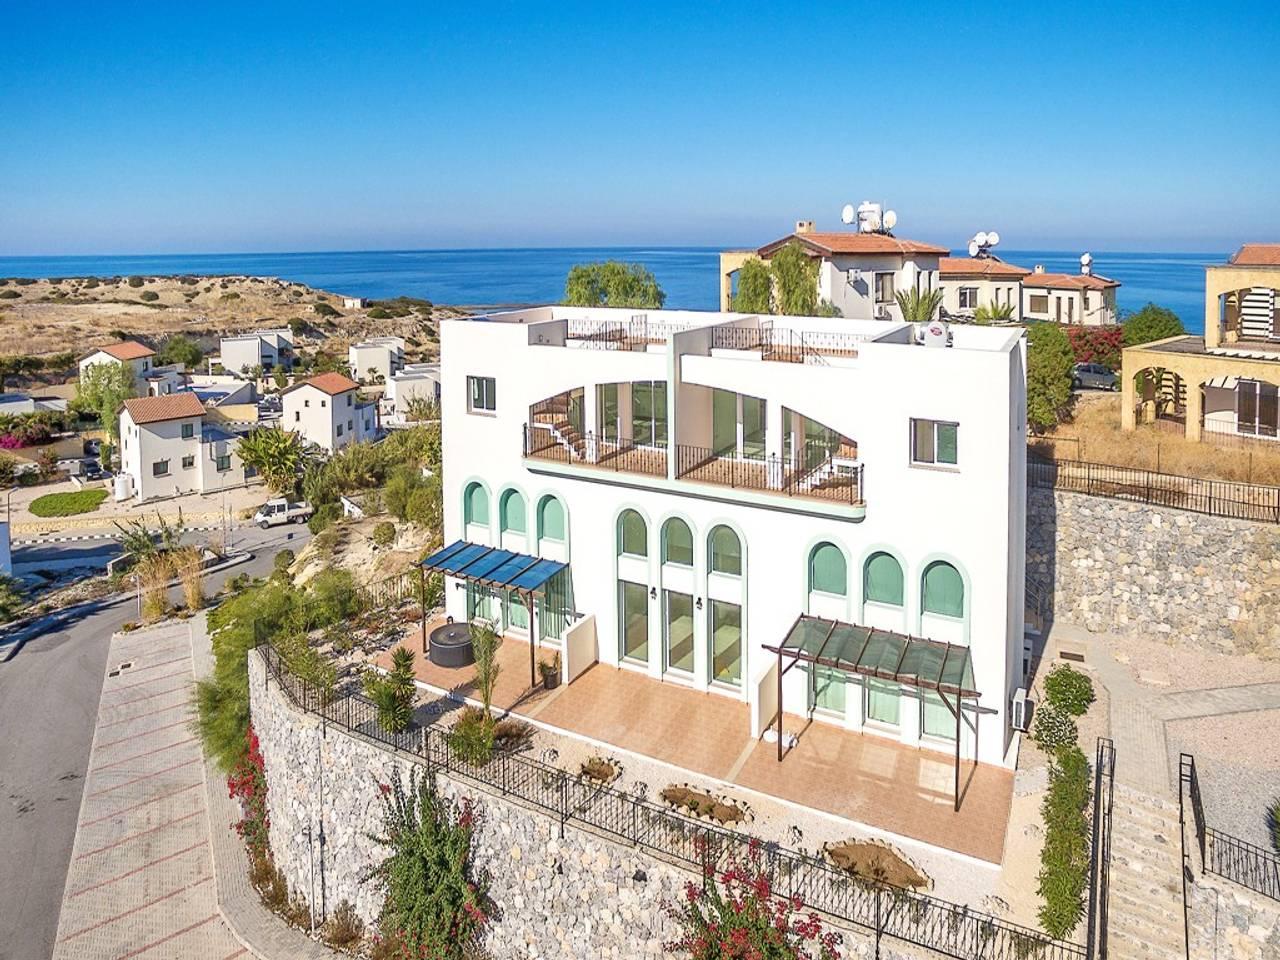 Apartment Joya Cyprus Nightingale Garden Apartment photo 28576321